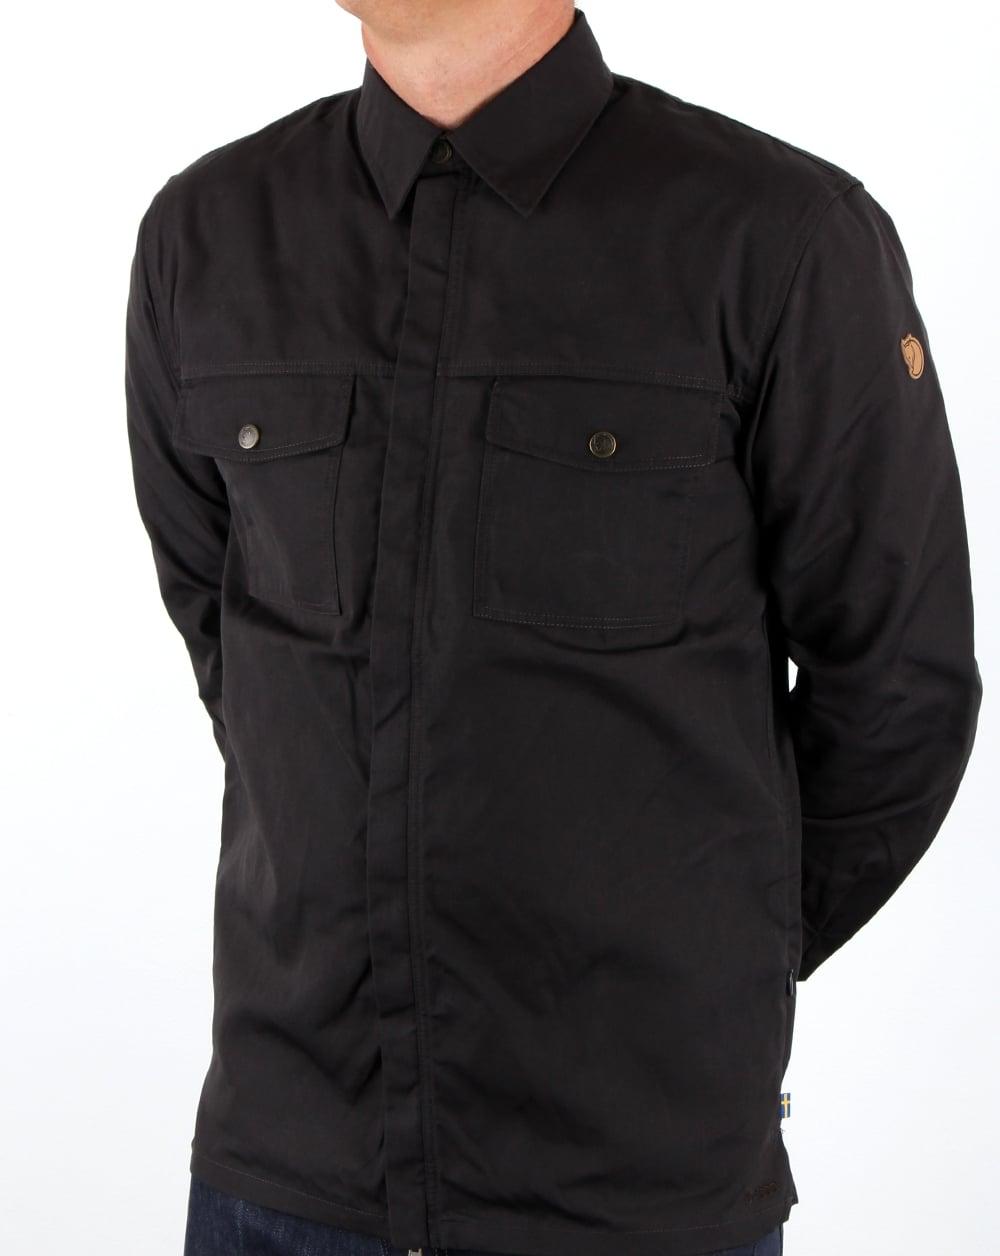 outlet store 5271b bd2f4 Fjallraven G1000 Shirt Dark Grey